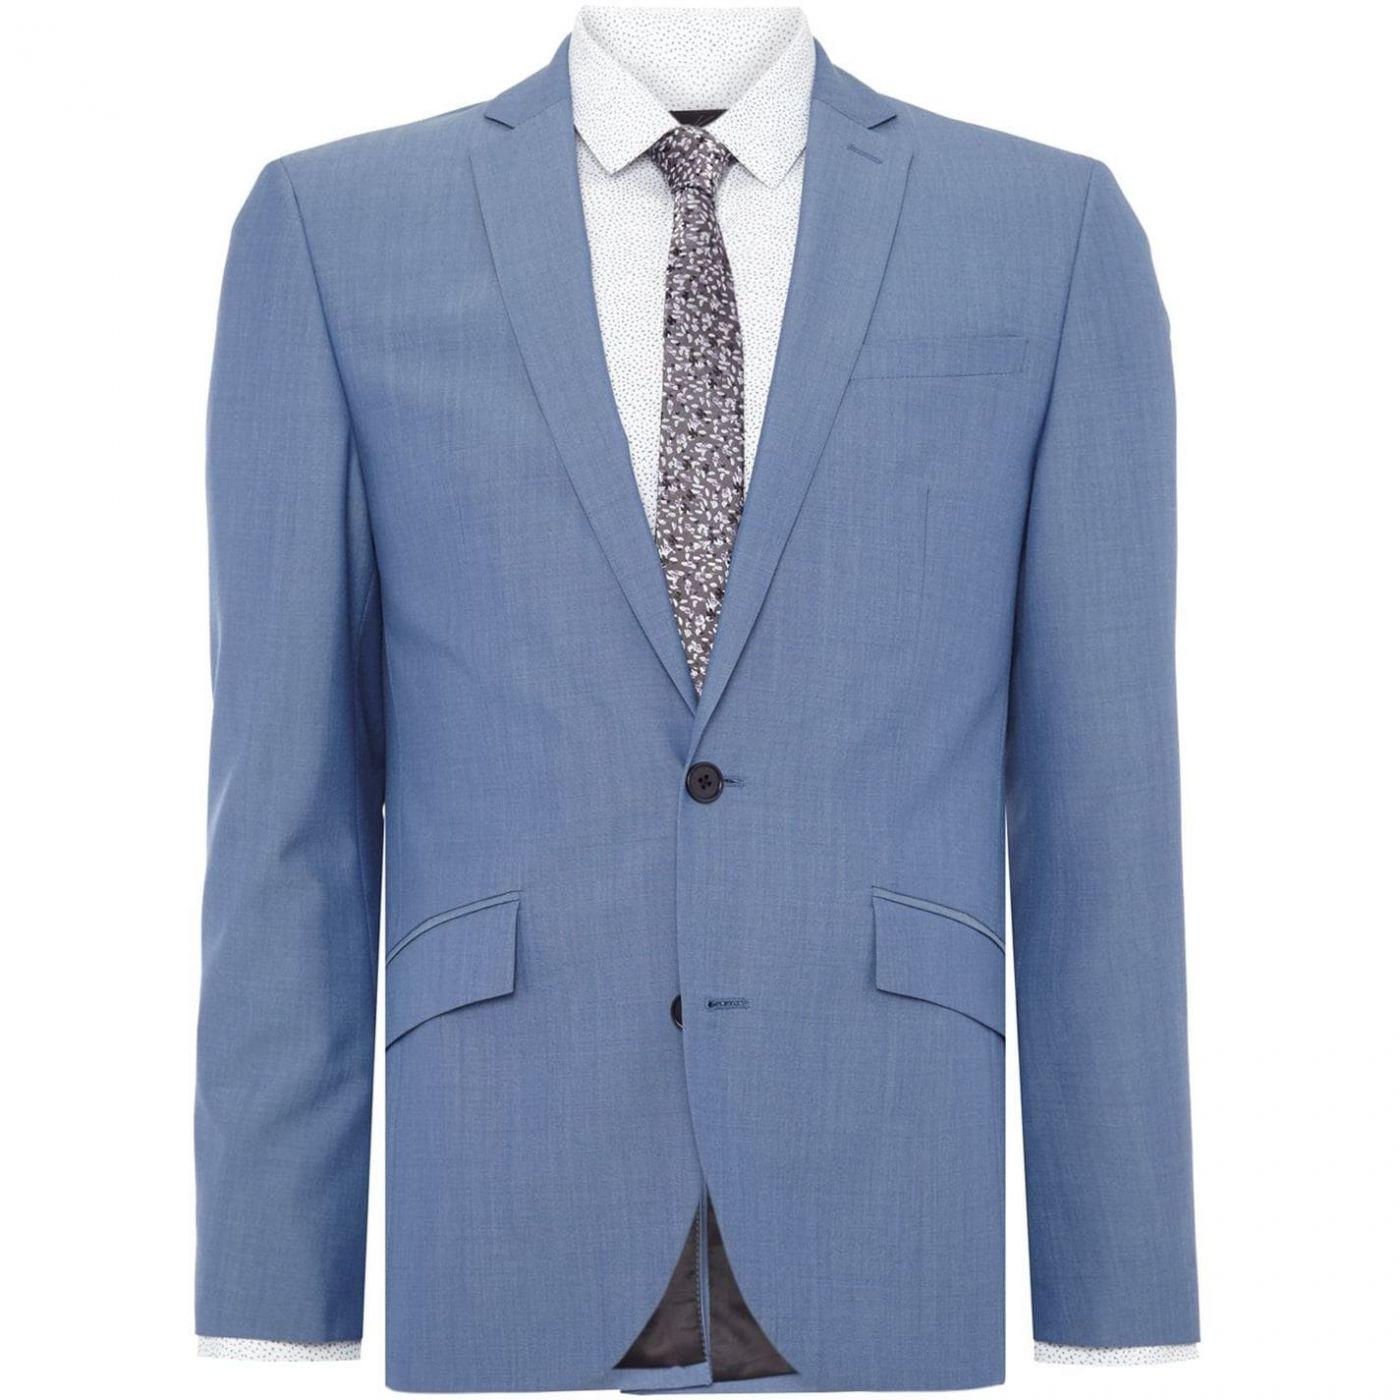 Kenneth Cole Ralph SB2 Slim Fit Suit Jacket